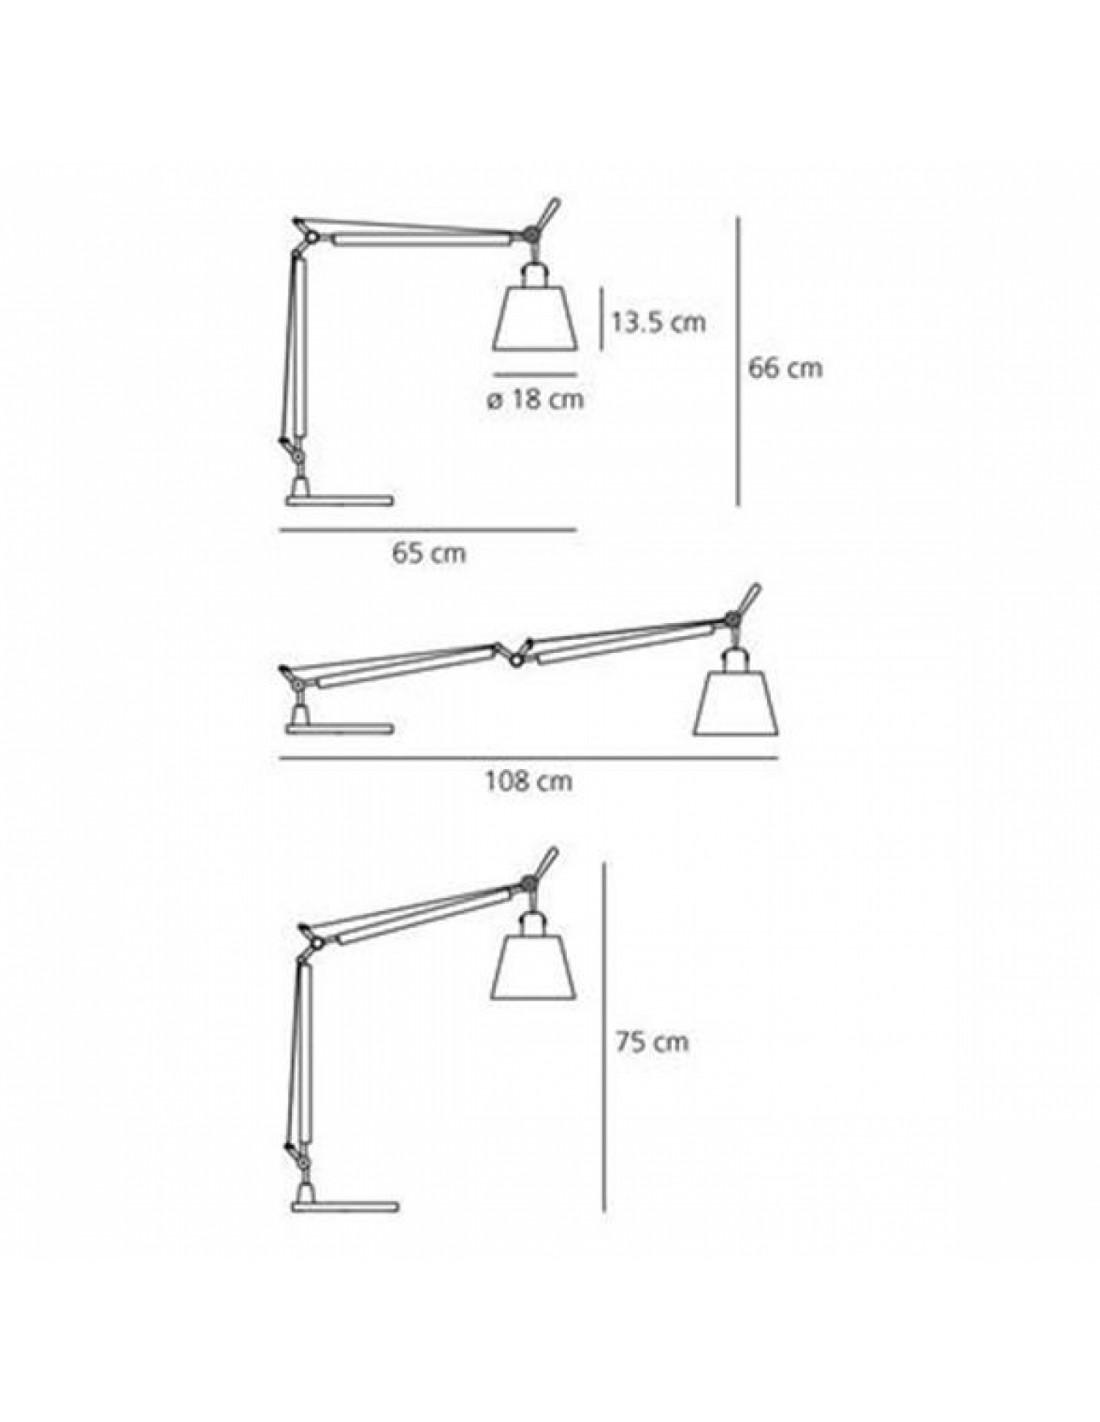 Lampe de table artemide tolomeo basculante plan - Table basculante cuisine ...